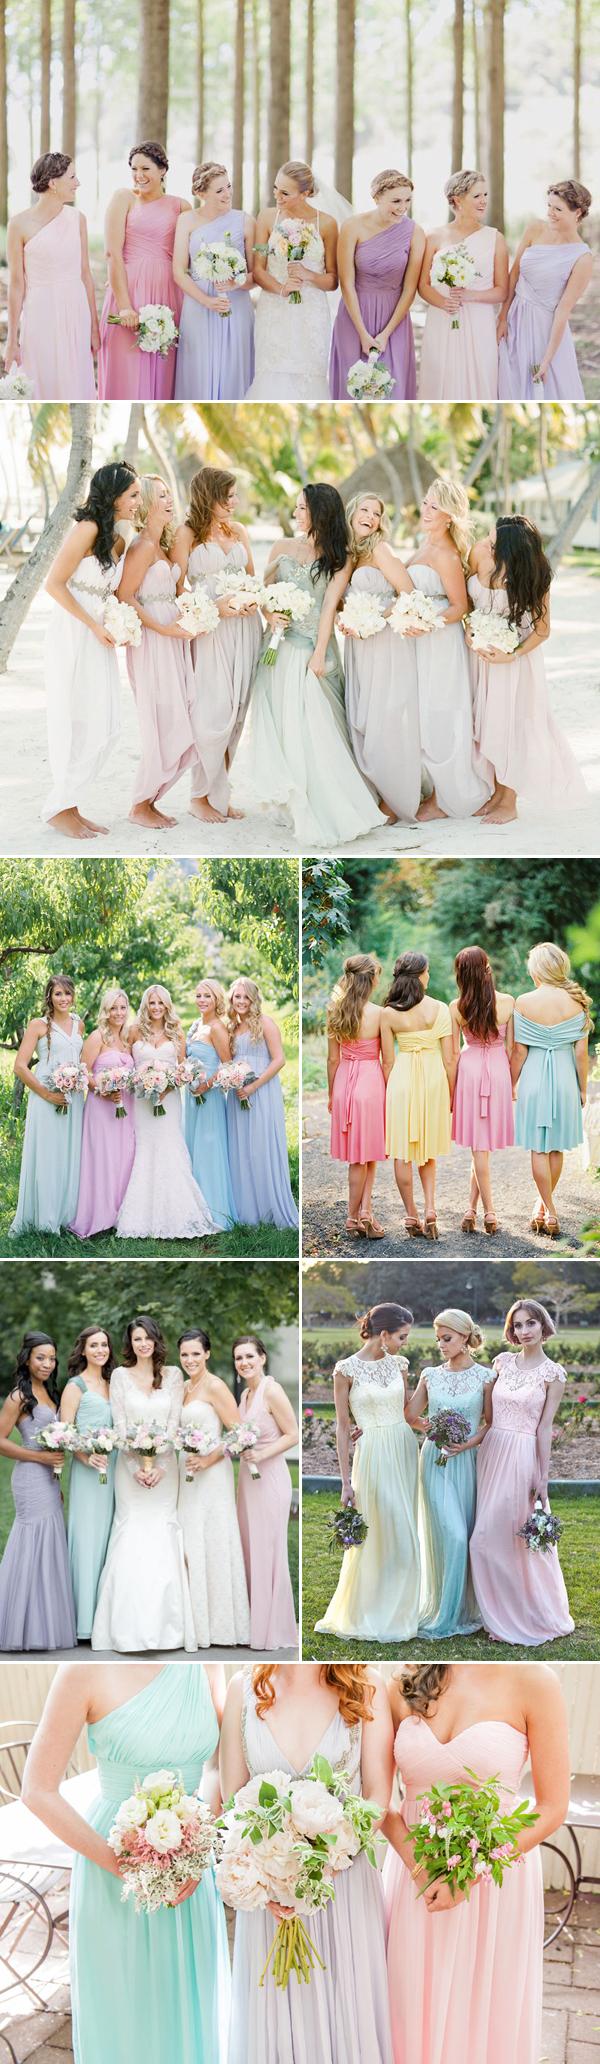 bridesmaid04-pastel